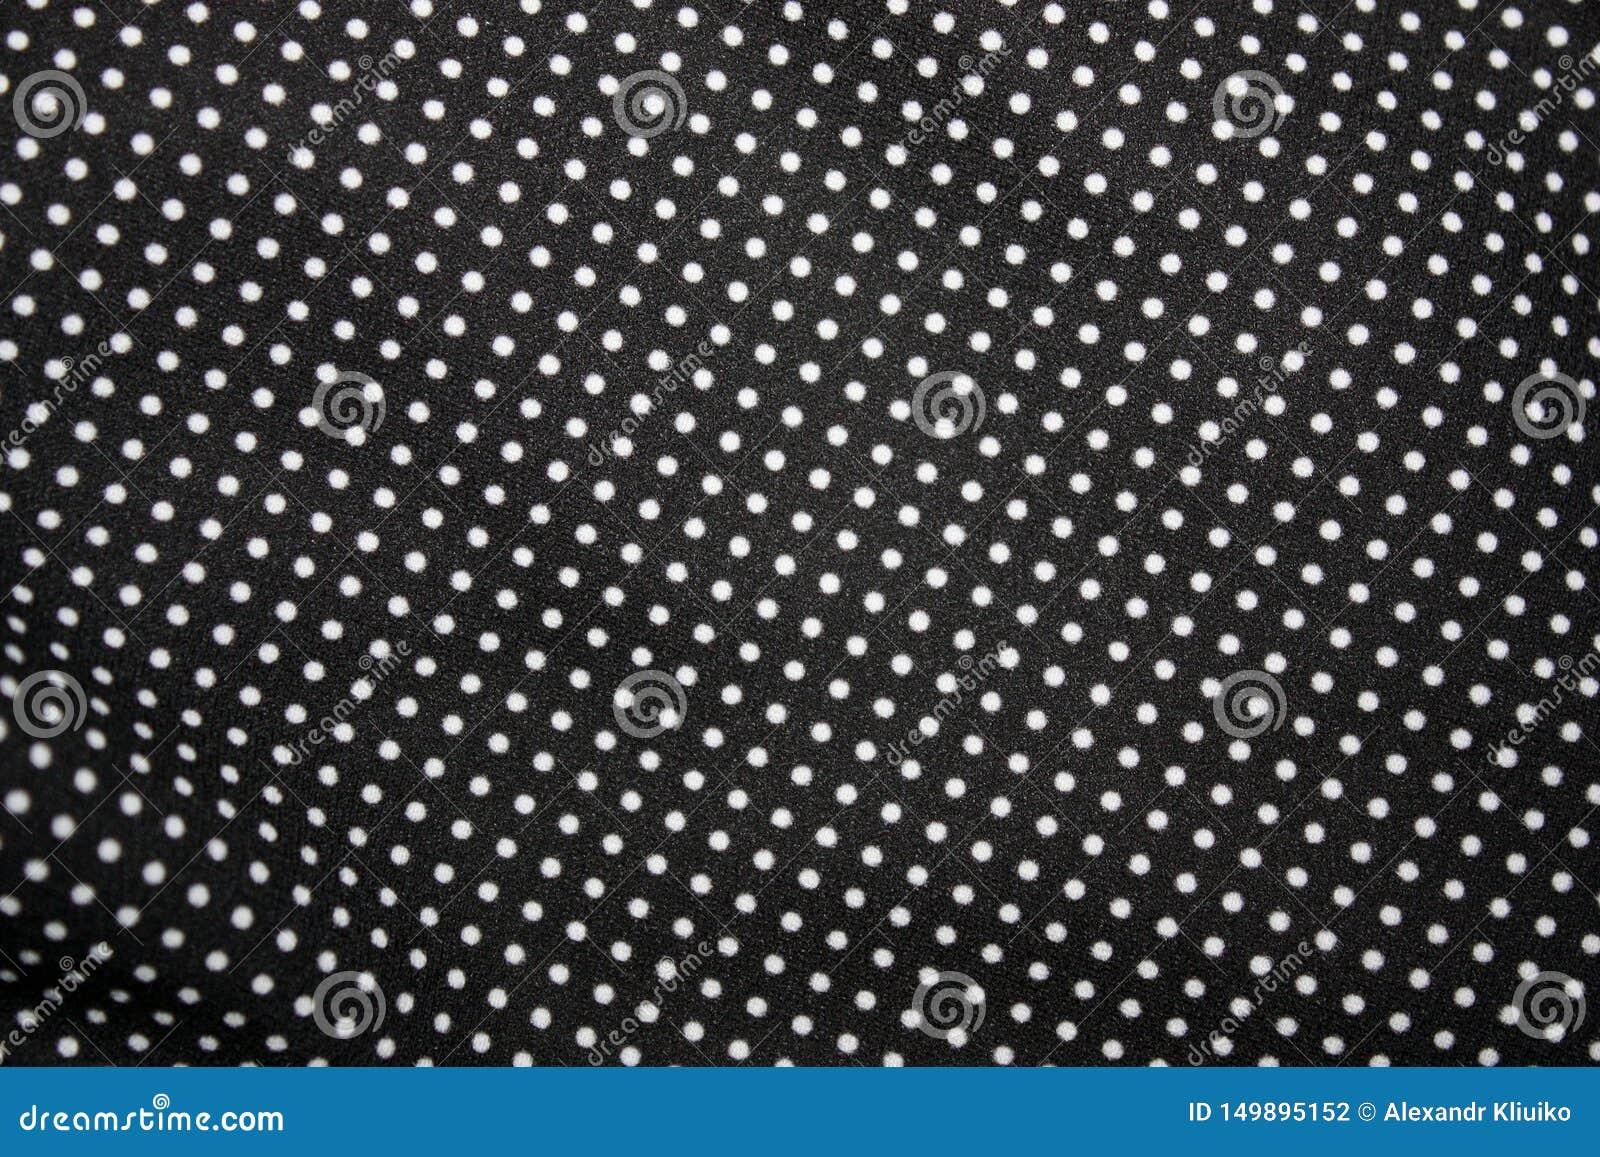 Black fabric and white tiny polka dot background, close-up